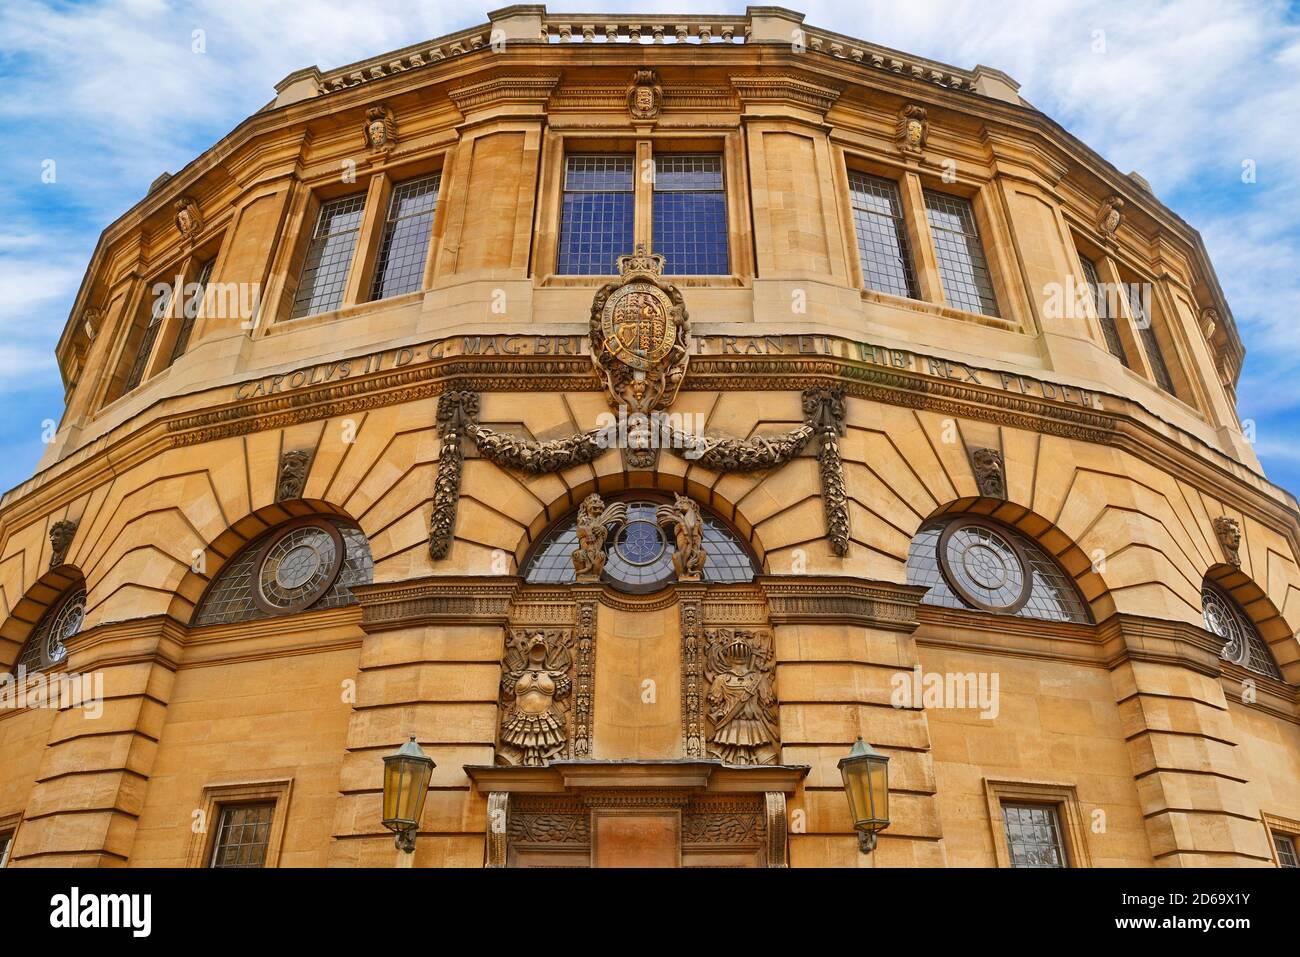 The Sheldonian Theatre, Oxford, England, United Kingdom Stock Photo